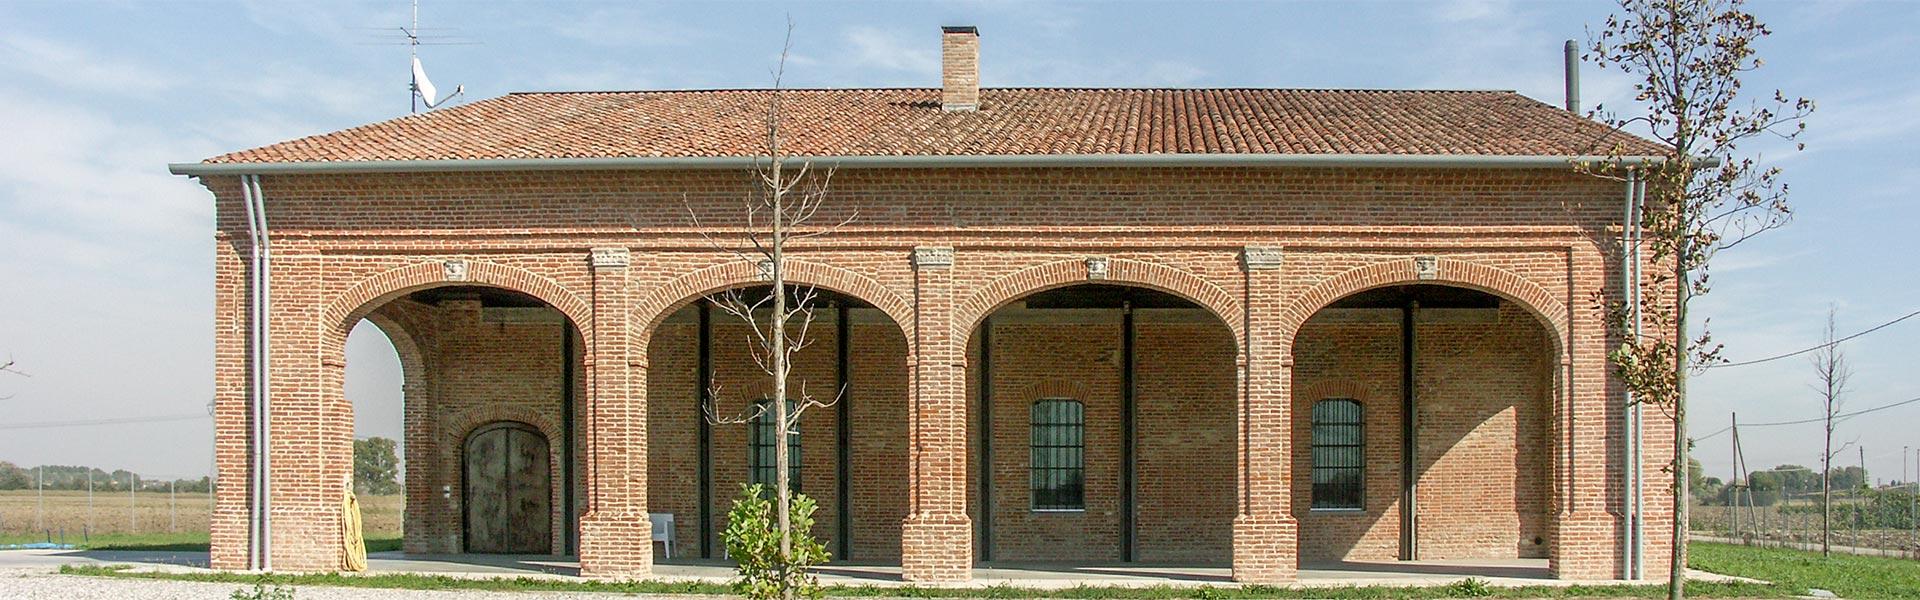 Europadana impresa edile parma elenco imprese edili for Imprese edili e costruzioni londra